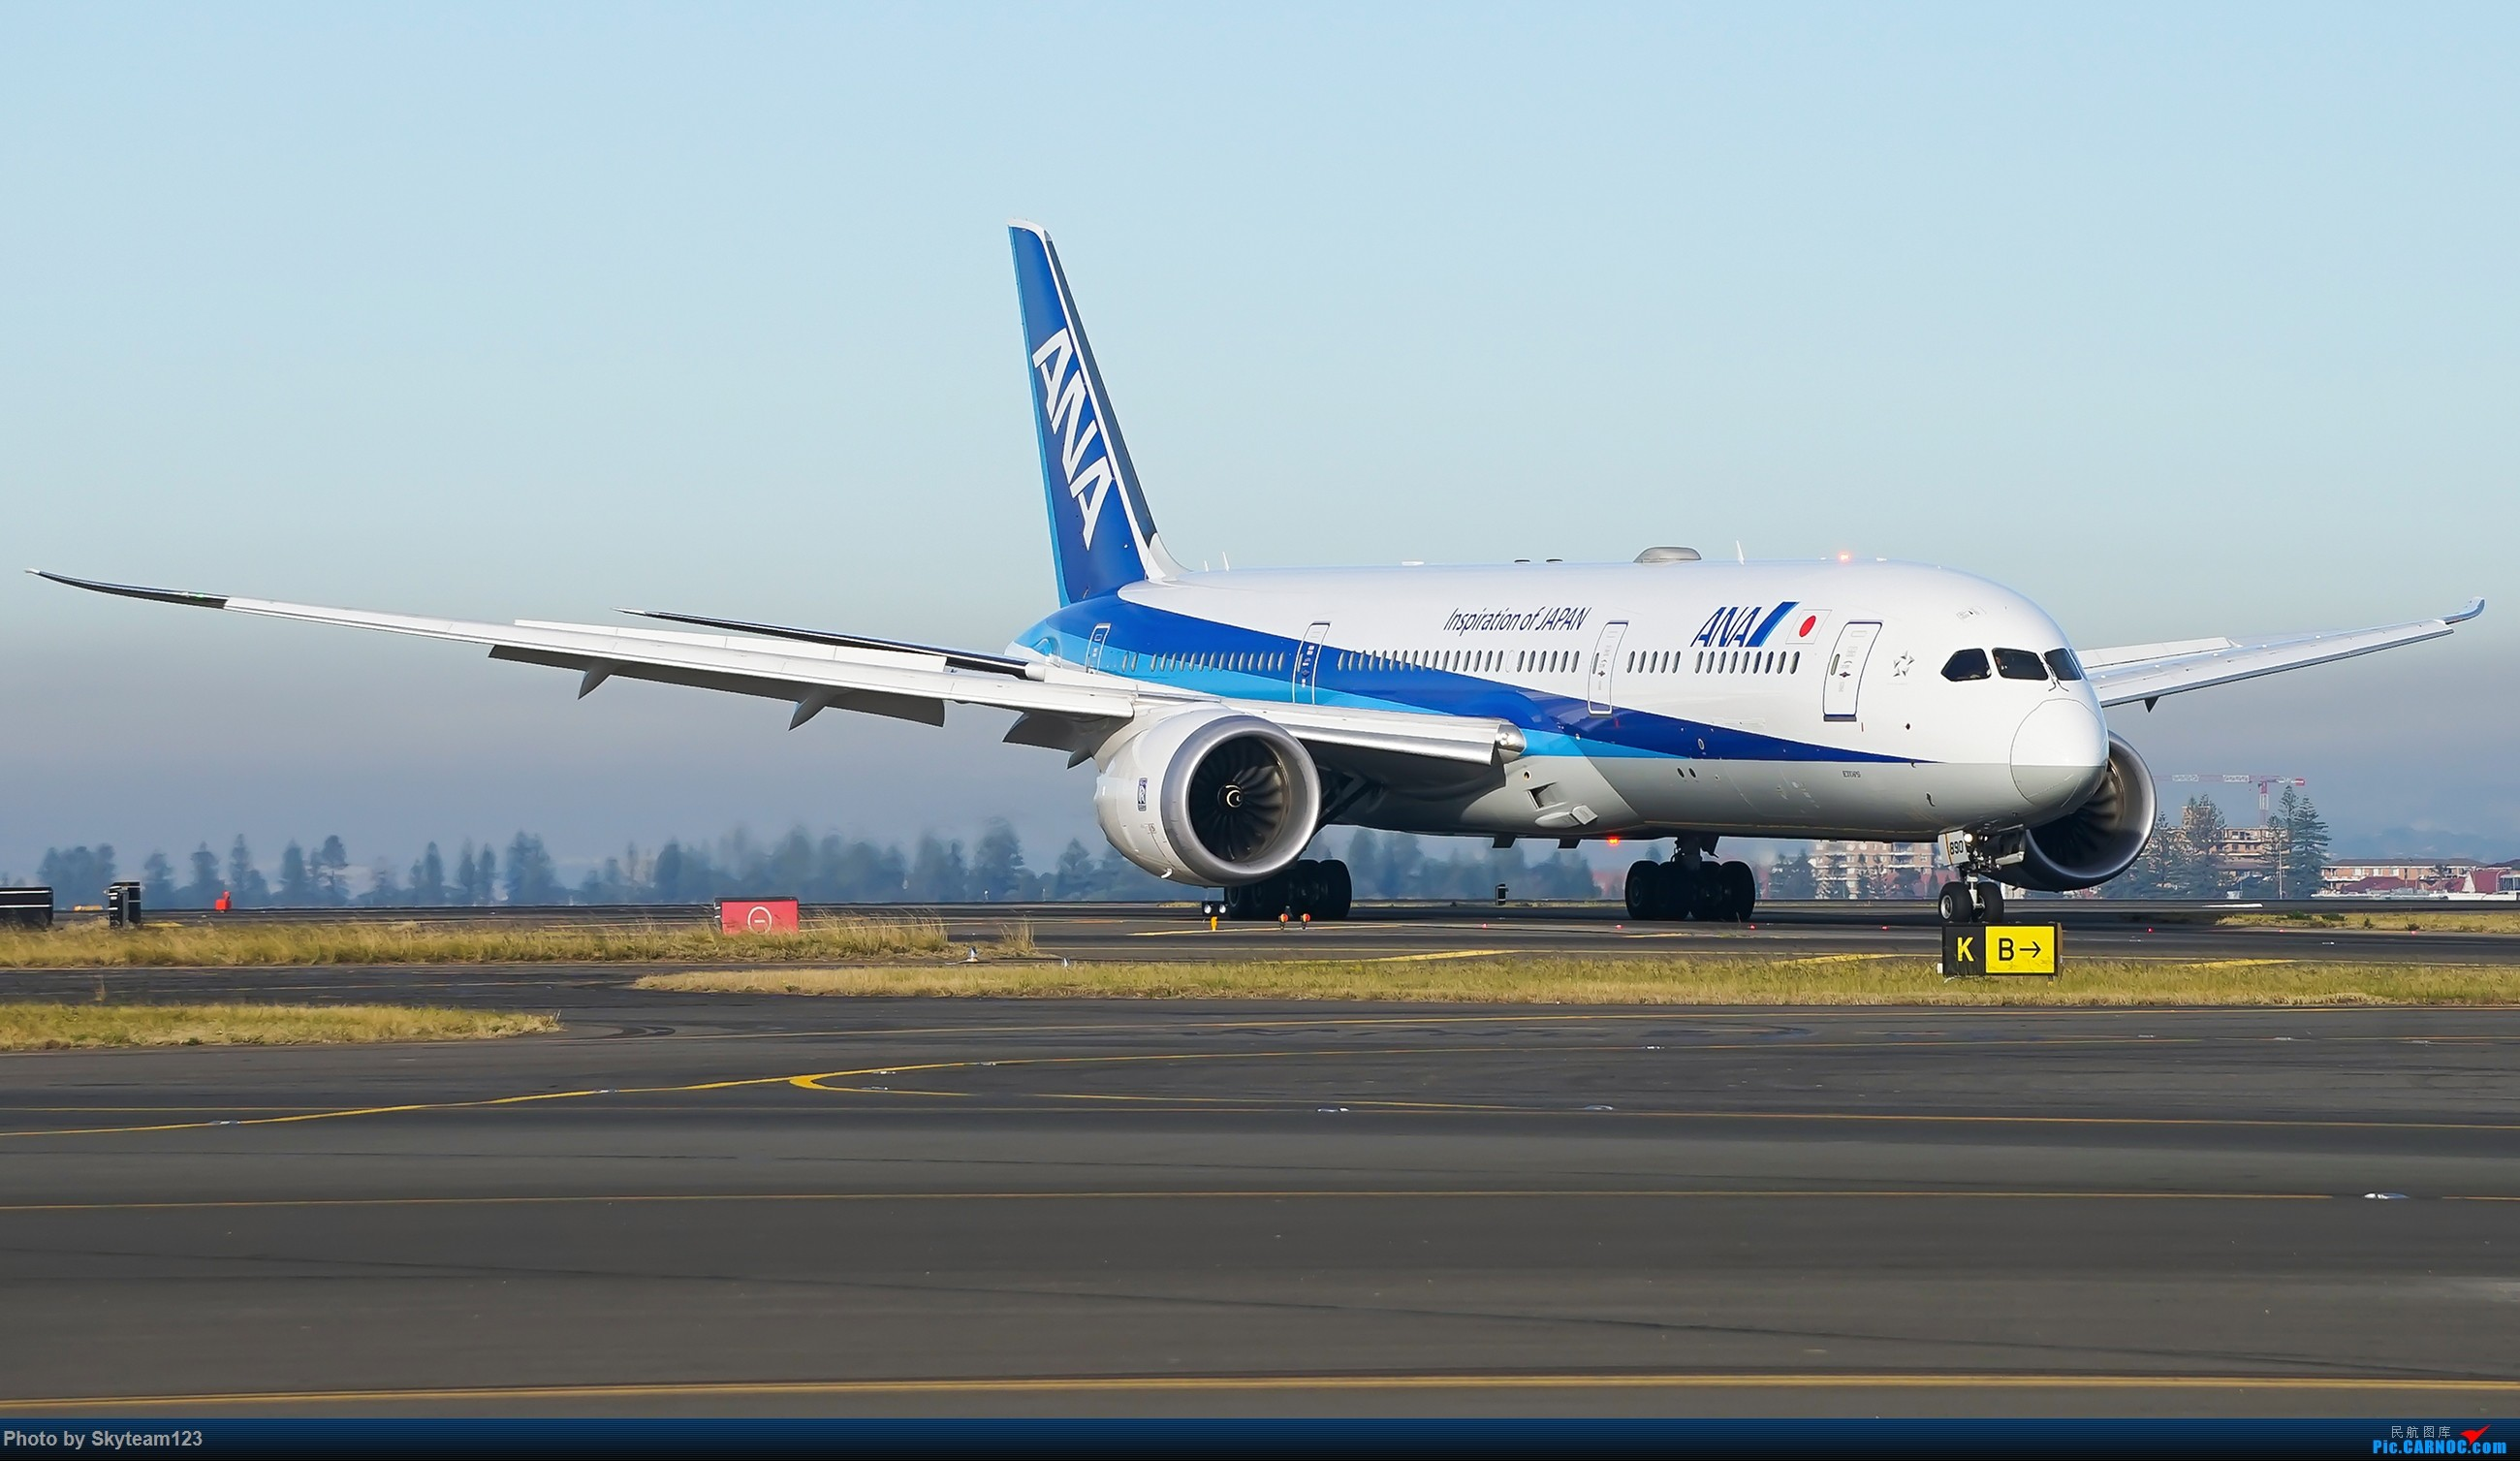 Re:[原创][SYD] 再访Blu EMU停车场 早上34L抵港出发杂图几张 BOEING 787-9 JA890A 澳大利亚悉尼金斯福德·史密斯机场